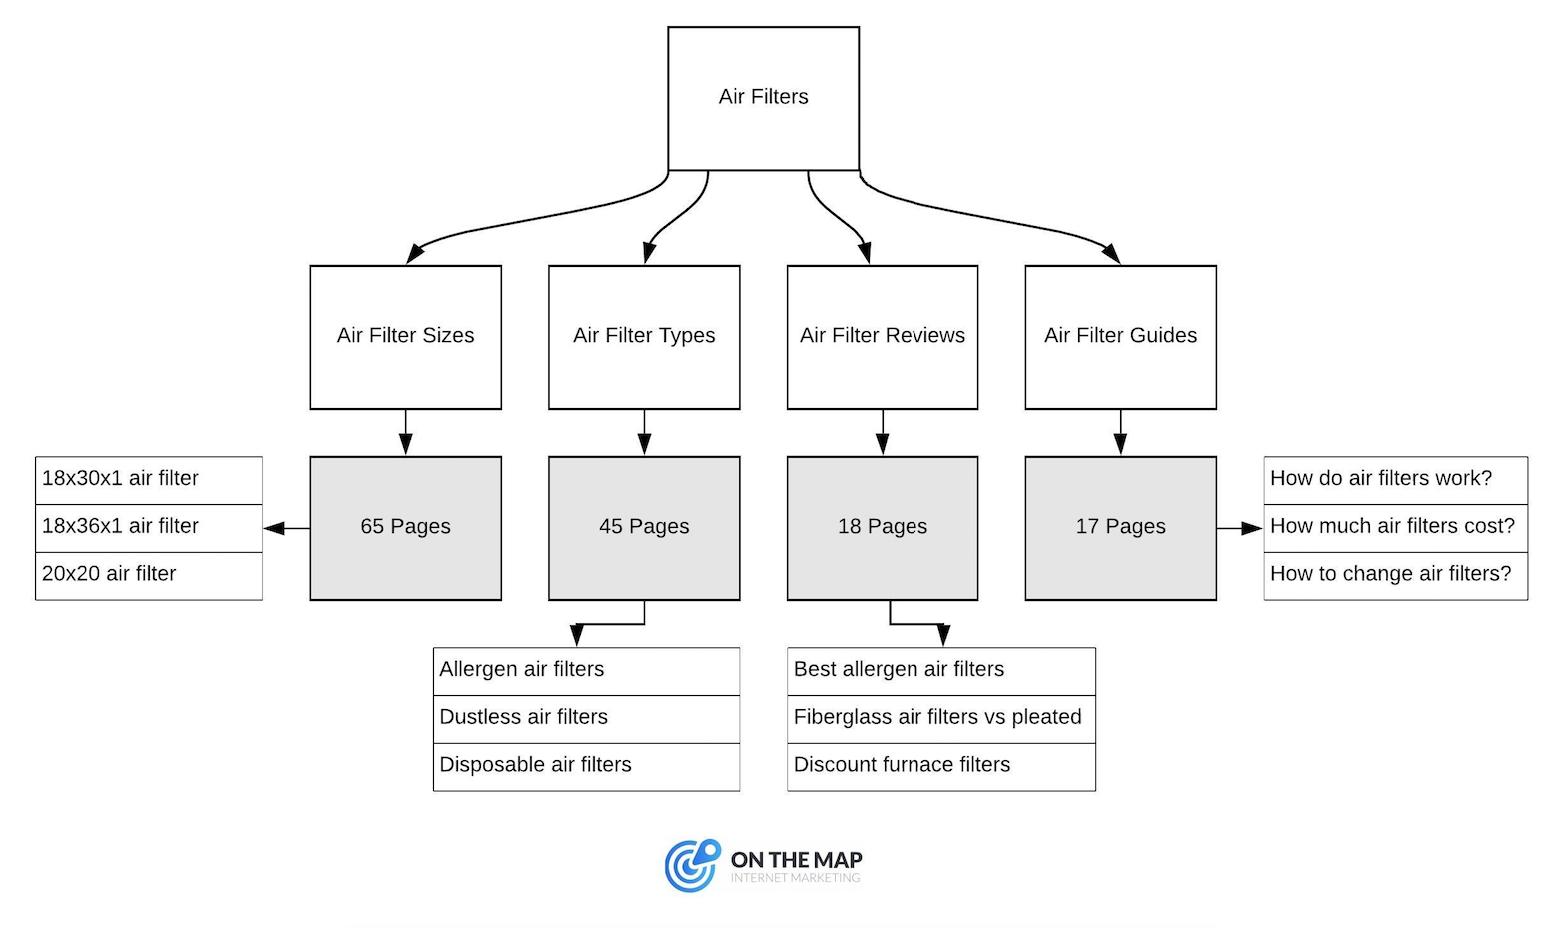 Website Architecture - Filterking.com